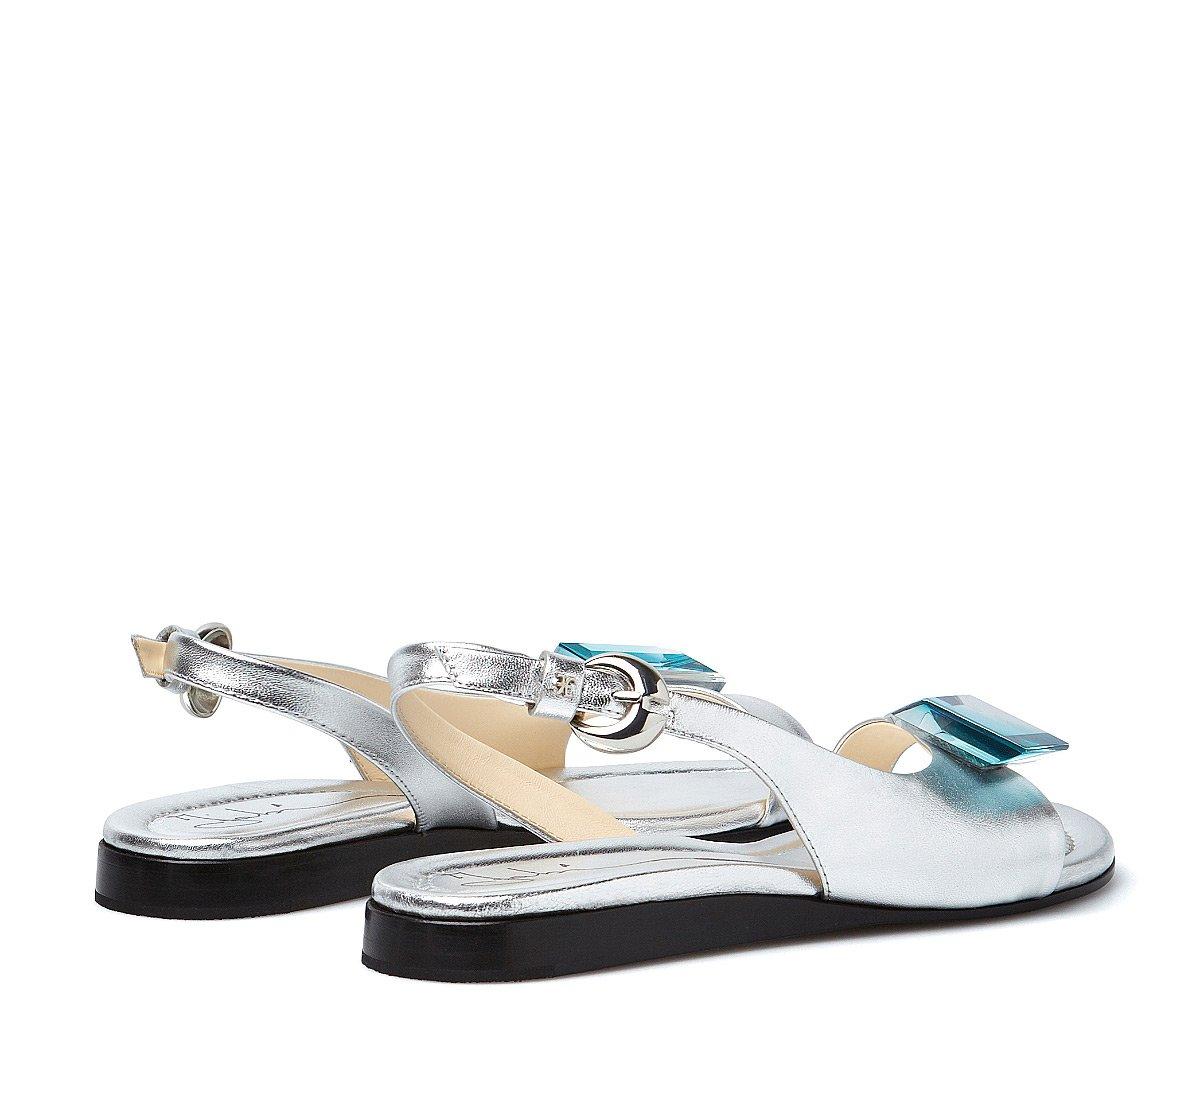 Exquisite calfskin sandals with plexi stone